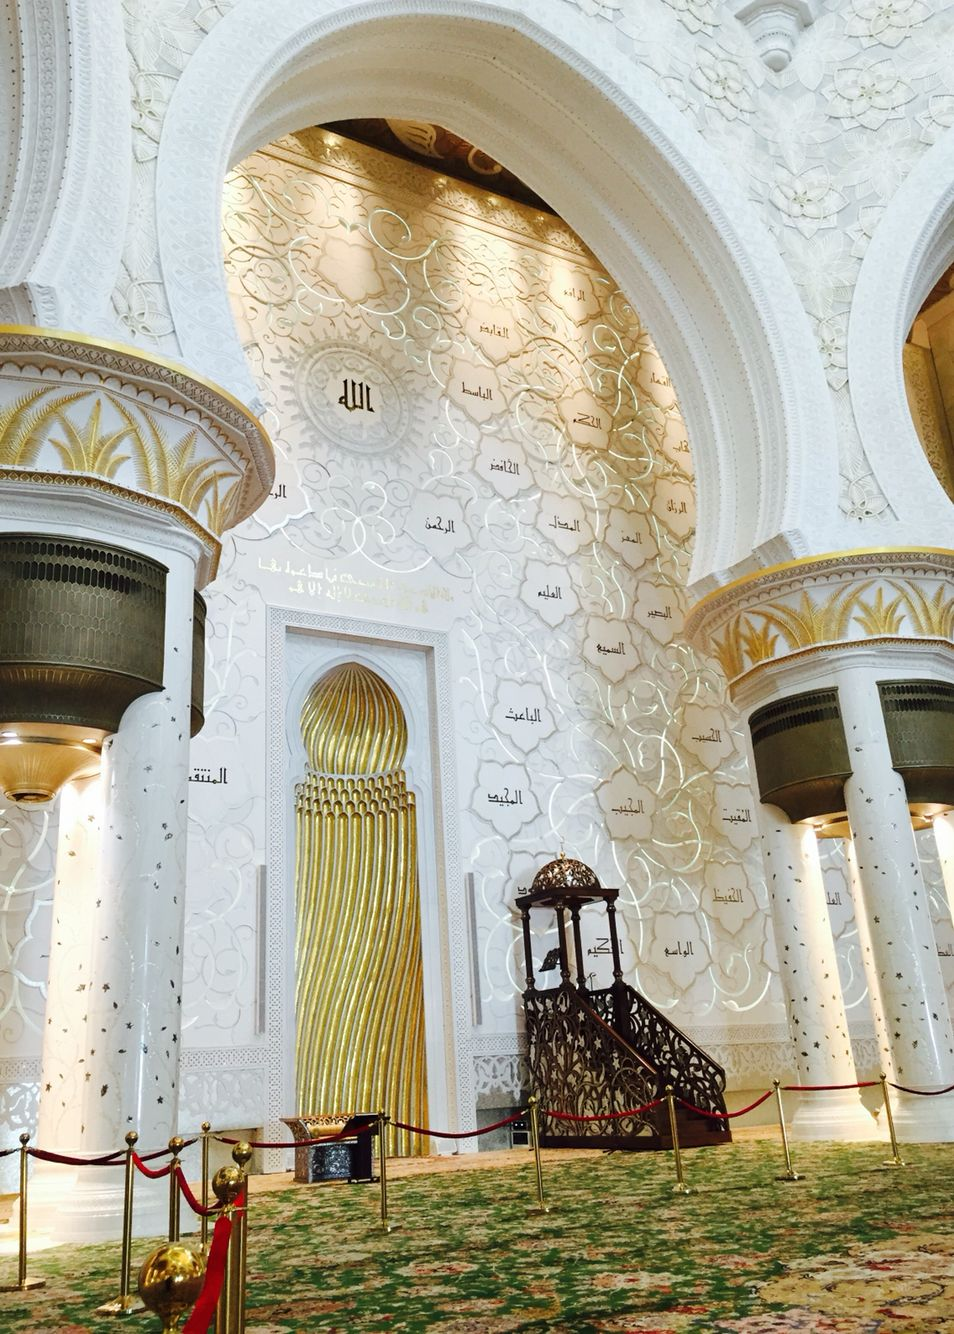 Sheikh Zayed Grand Mosque Mihrab Camiler Sanat